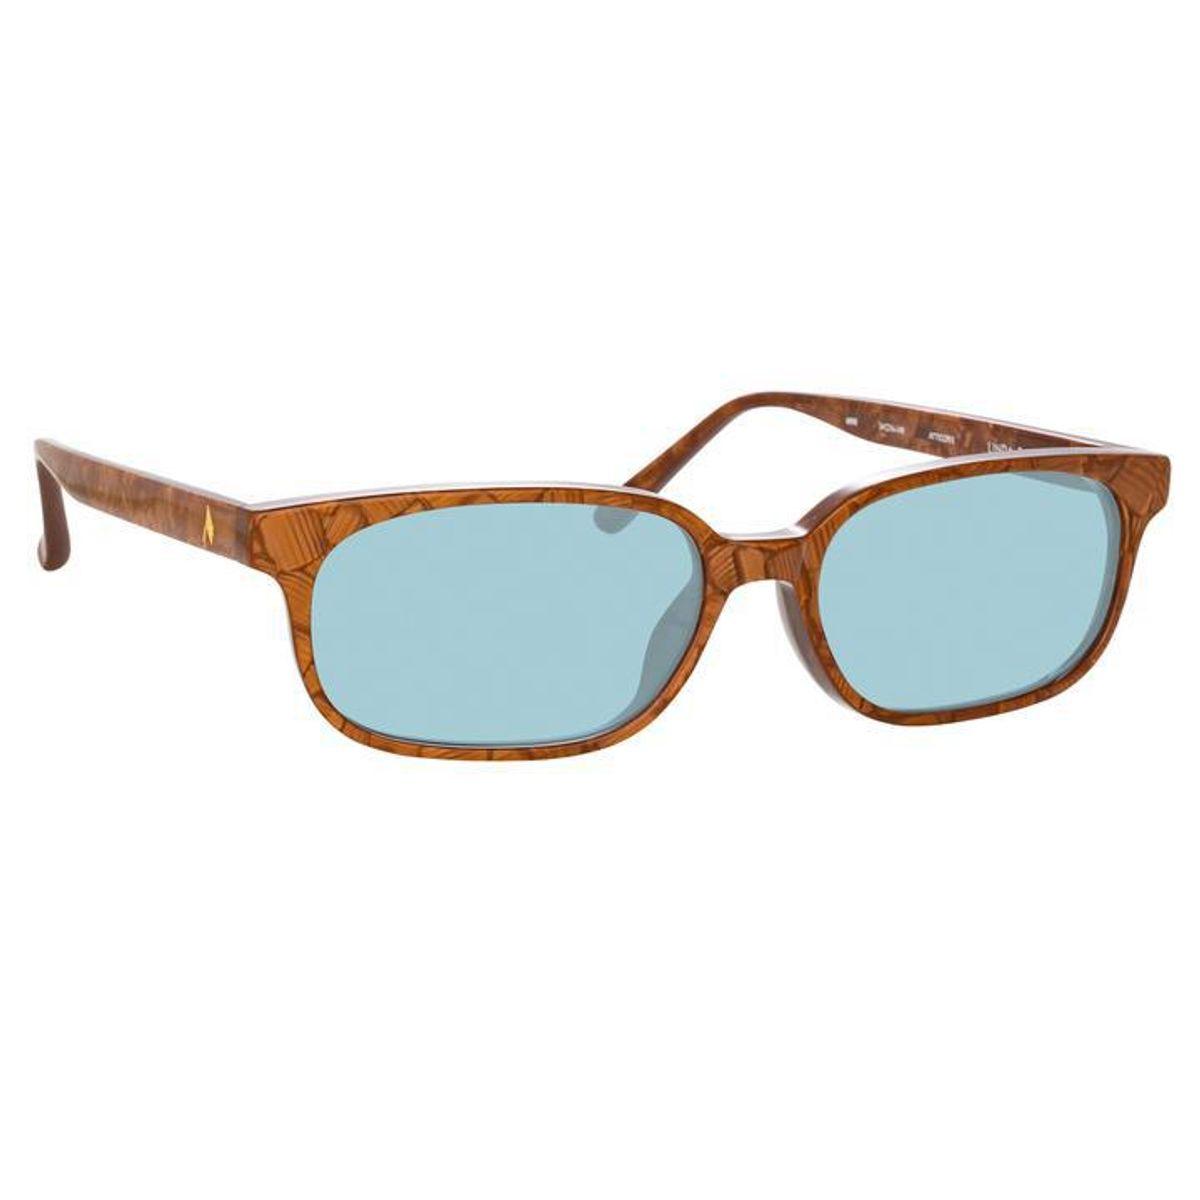 Gigi Rectangular Sunglasses in Brown and Turquoise